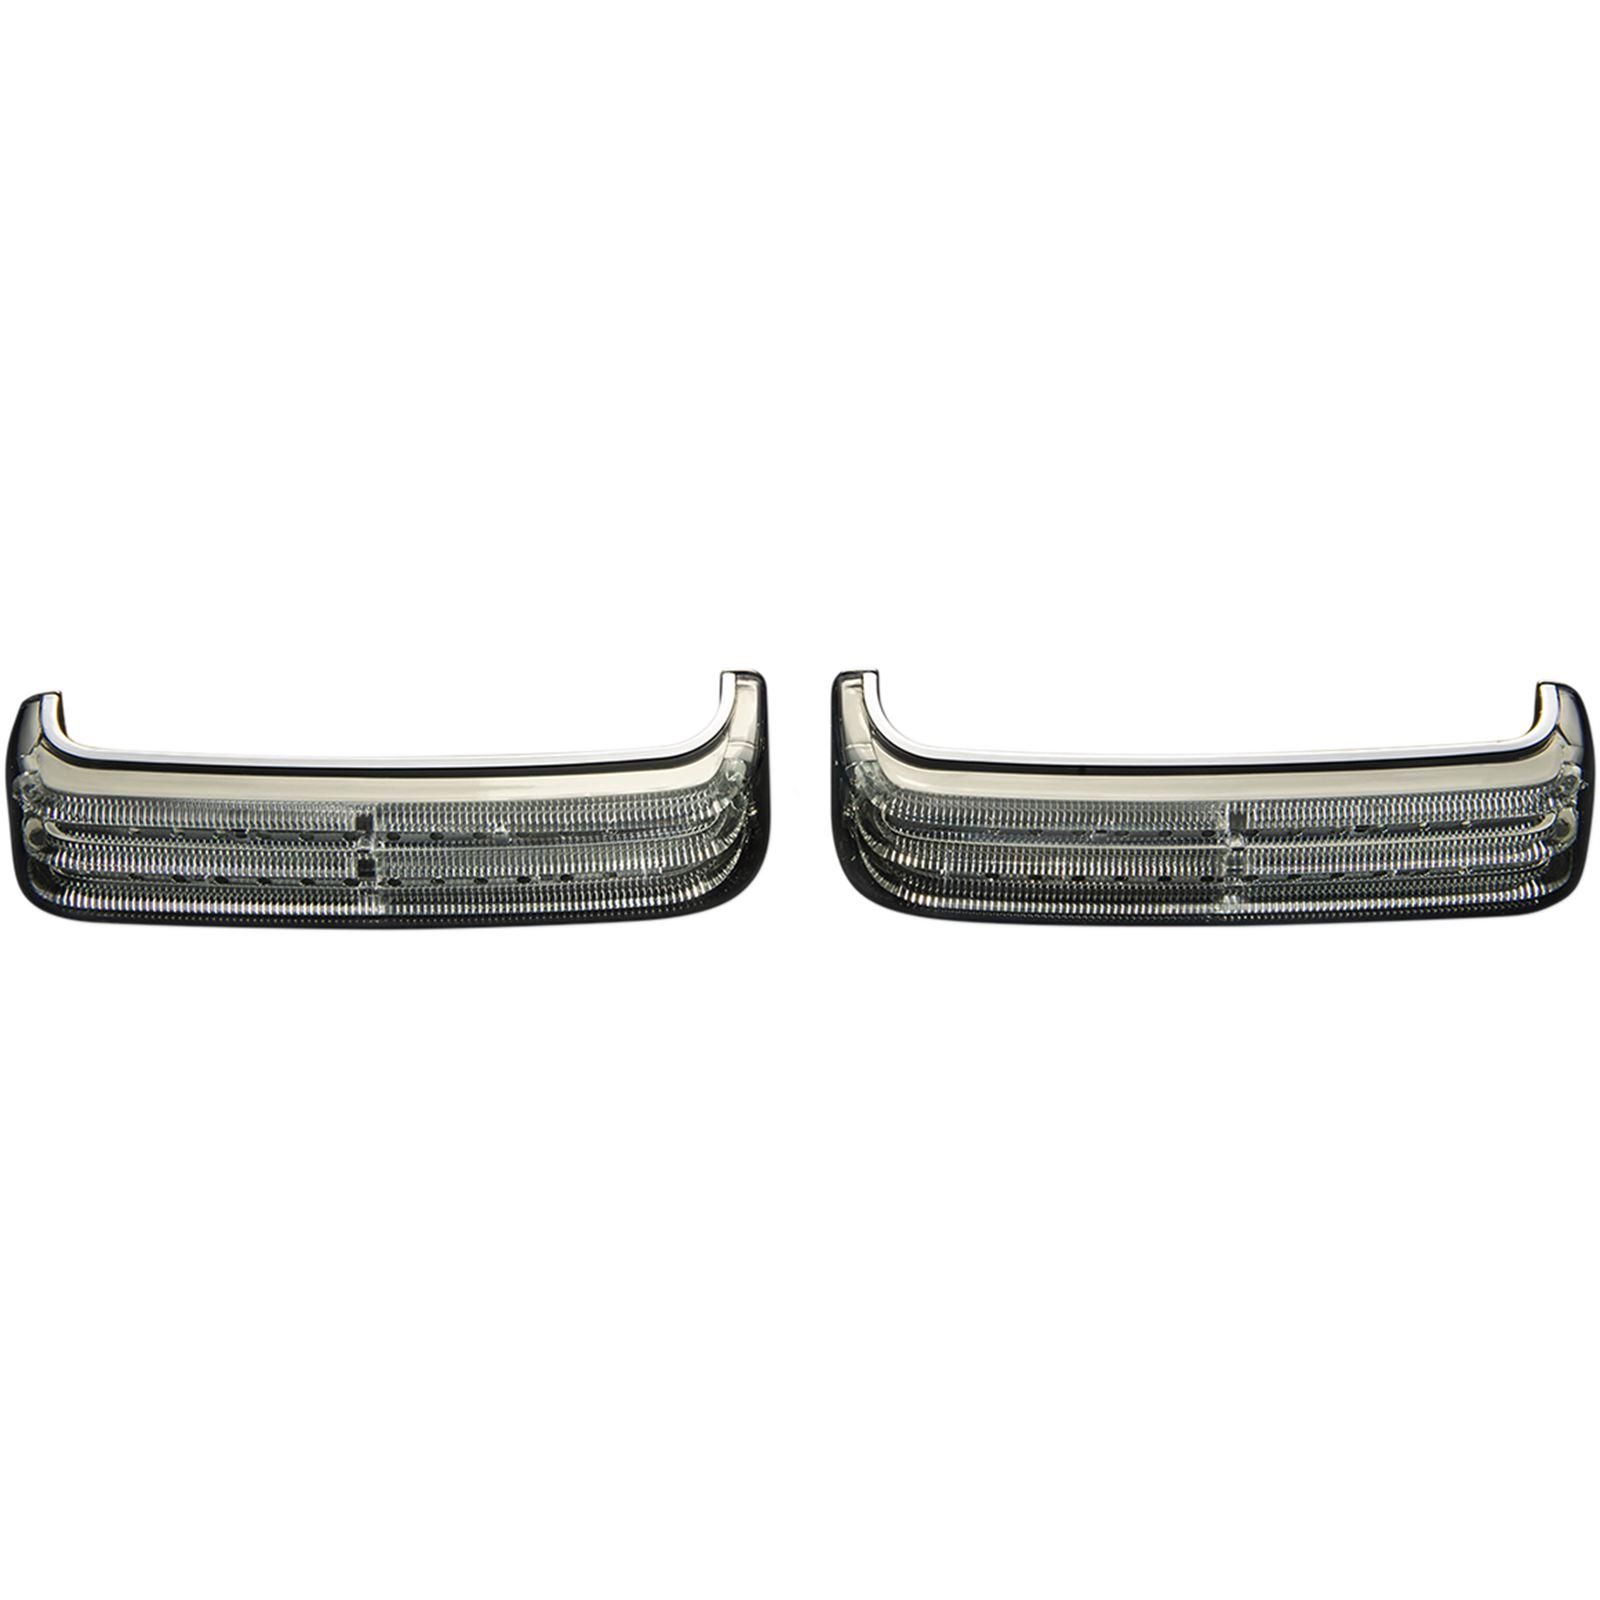 Custom Dynamics Saddlebag Lights - Chrome/Smoke